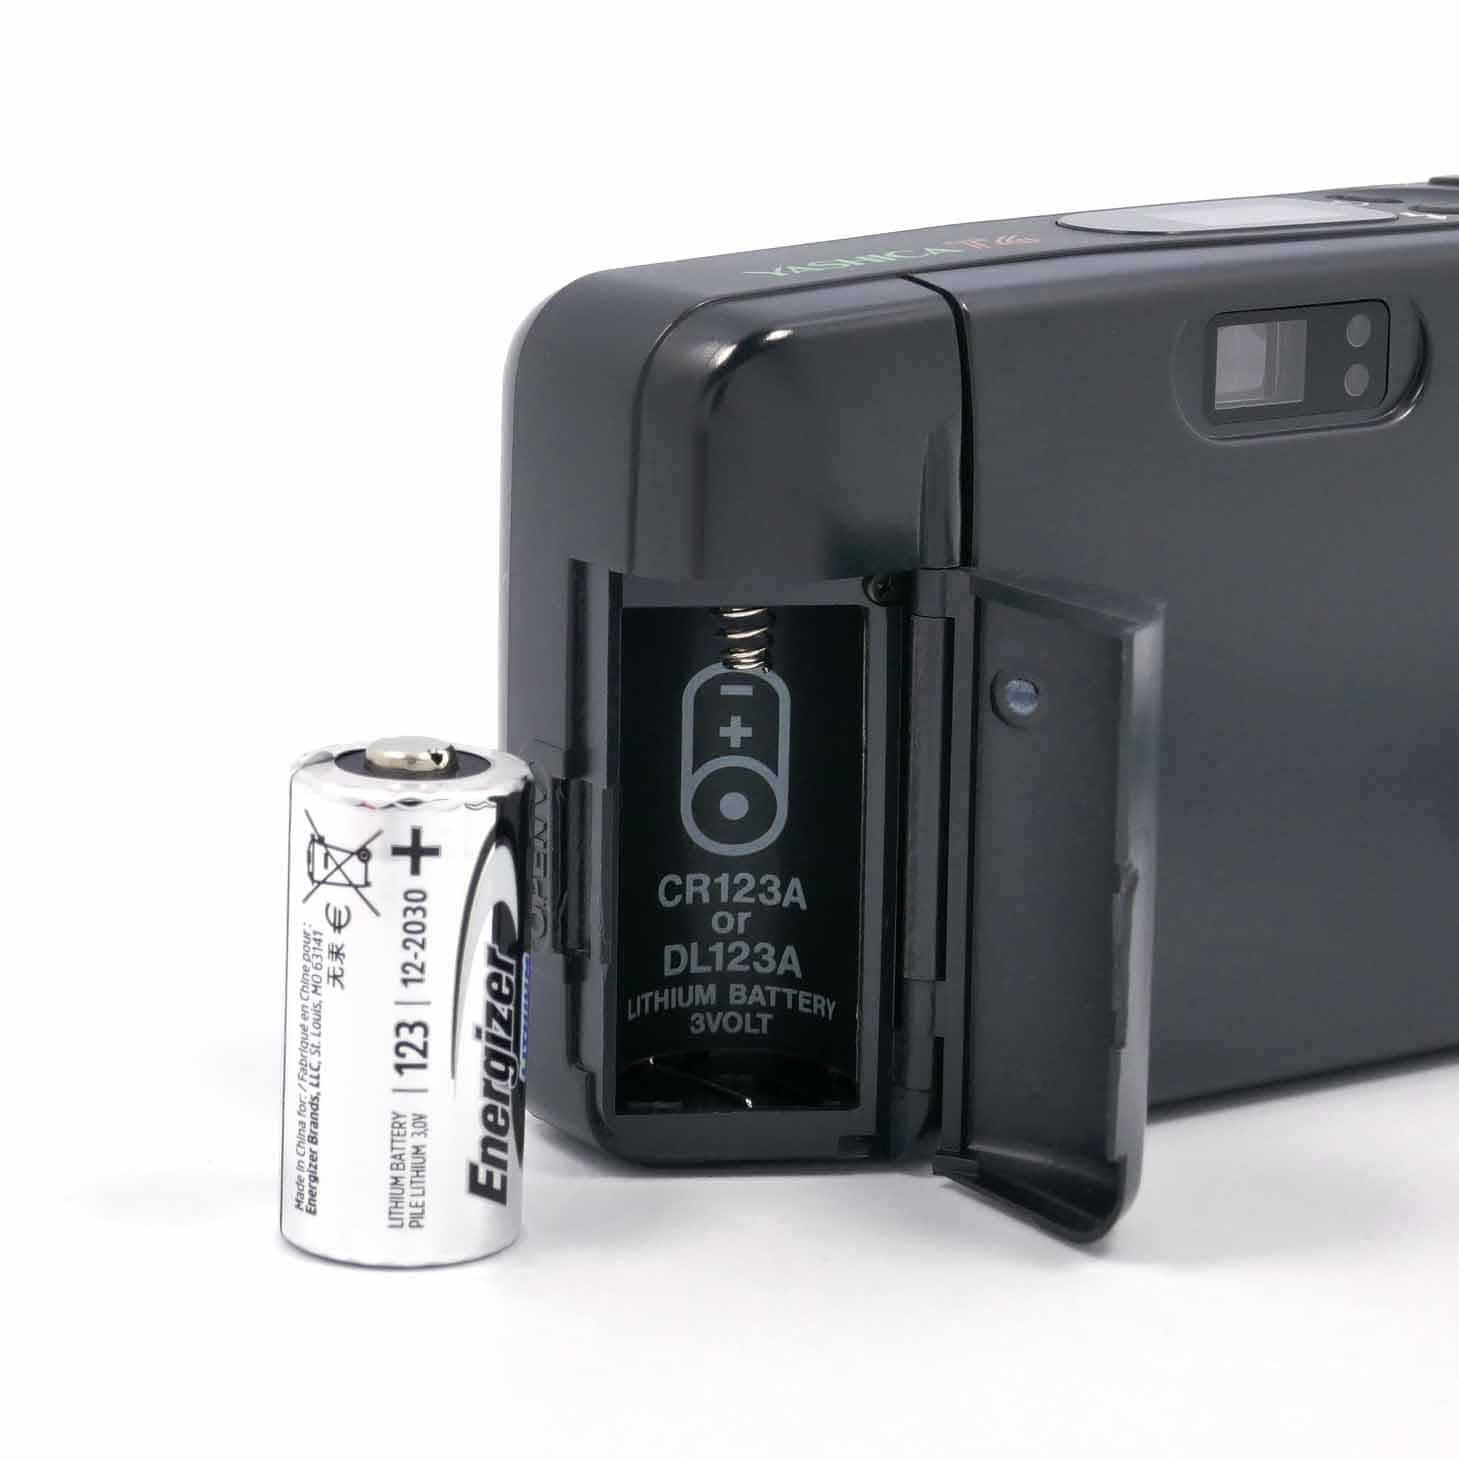 clean-cameras-Yashica-T4-Safari-08